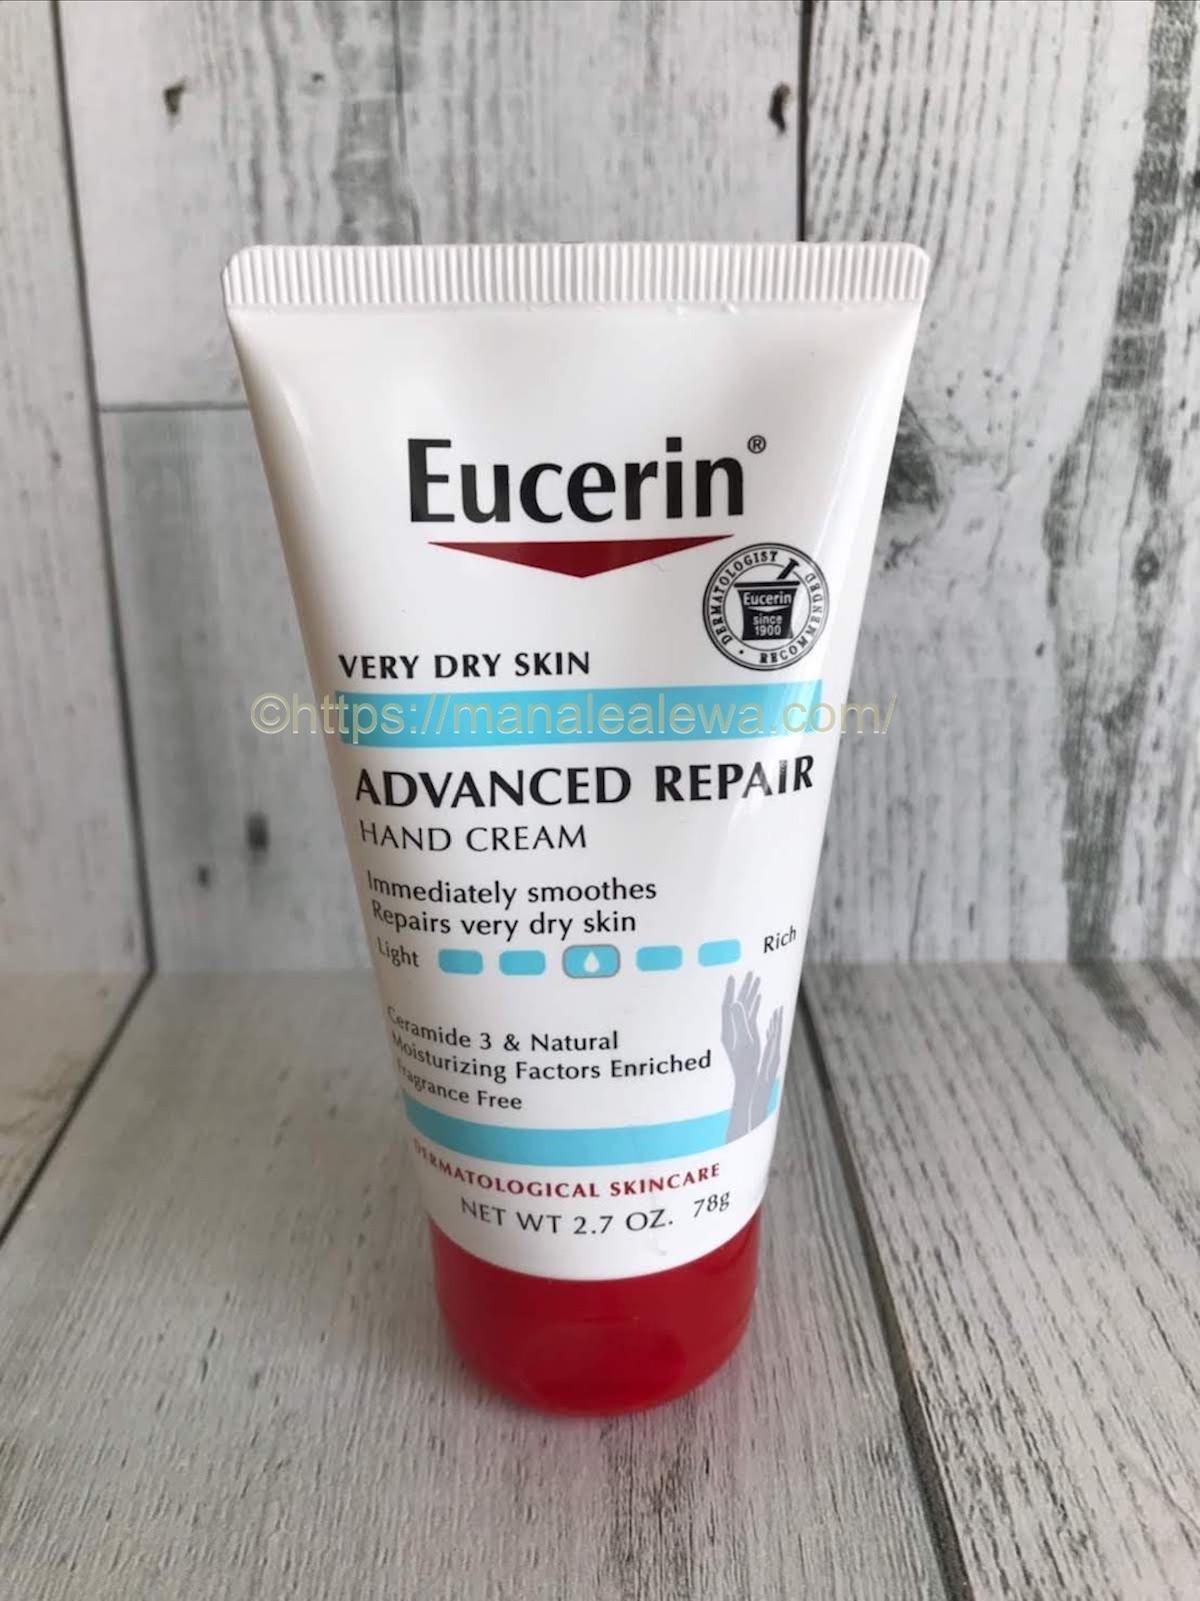 Eucerin-advanced-repair-hand-cream